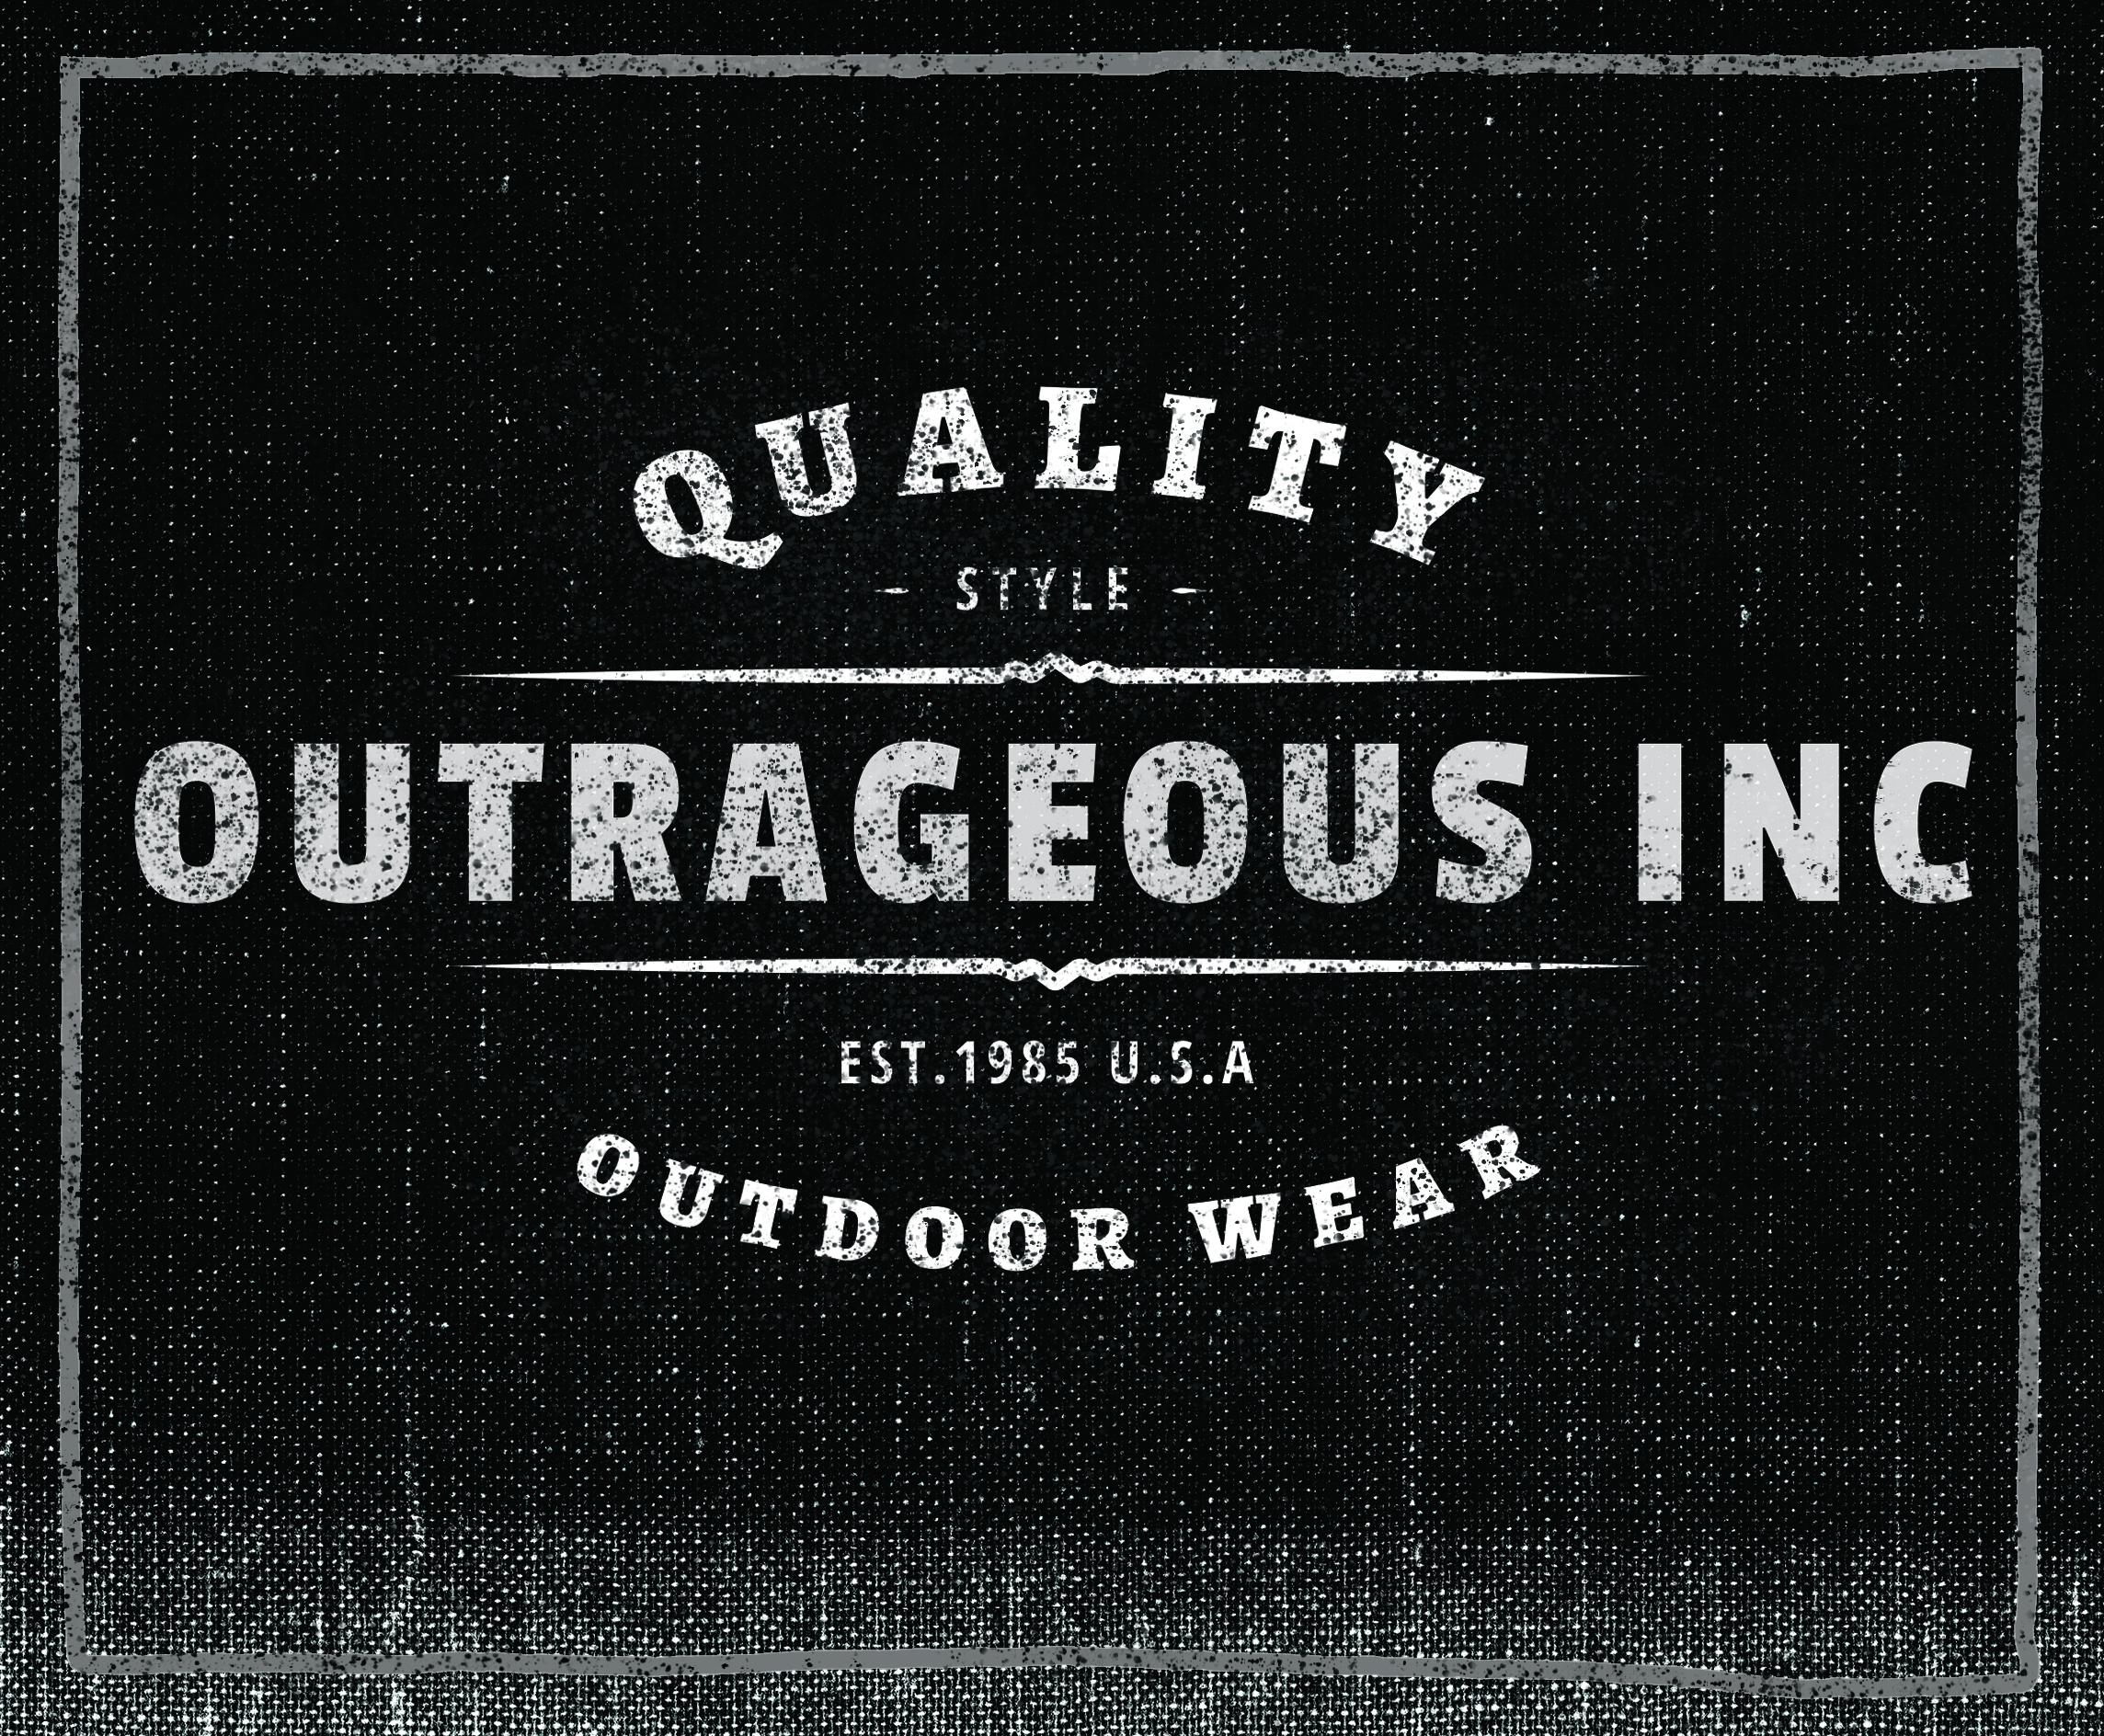 Outrageous_Label_Black1.jpg